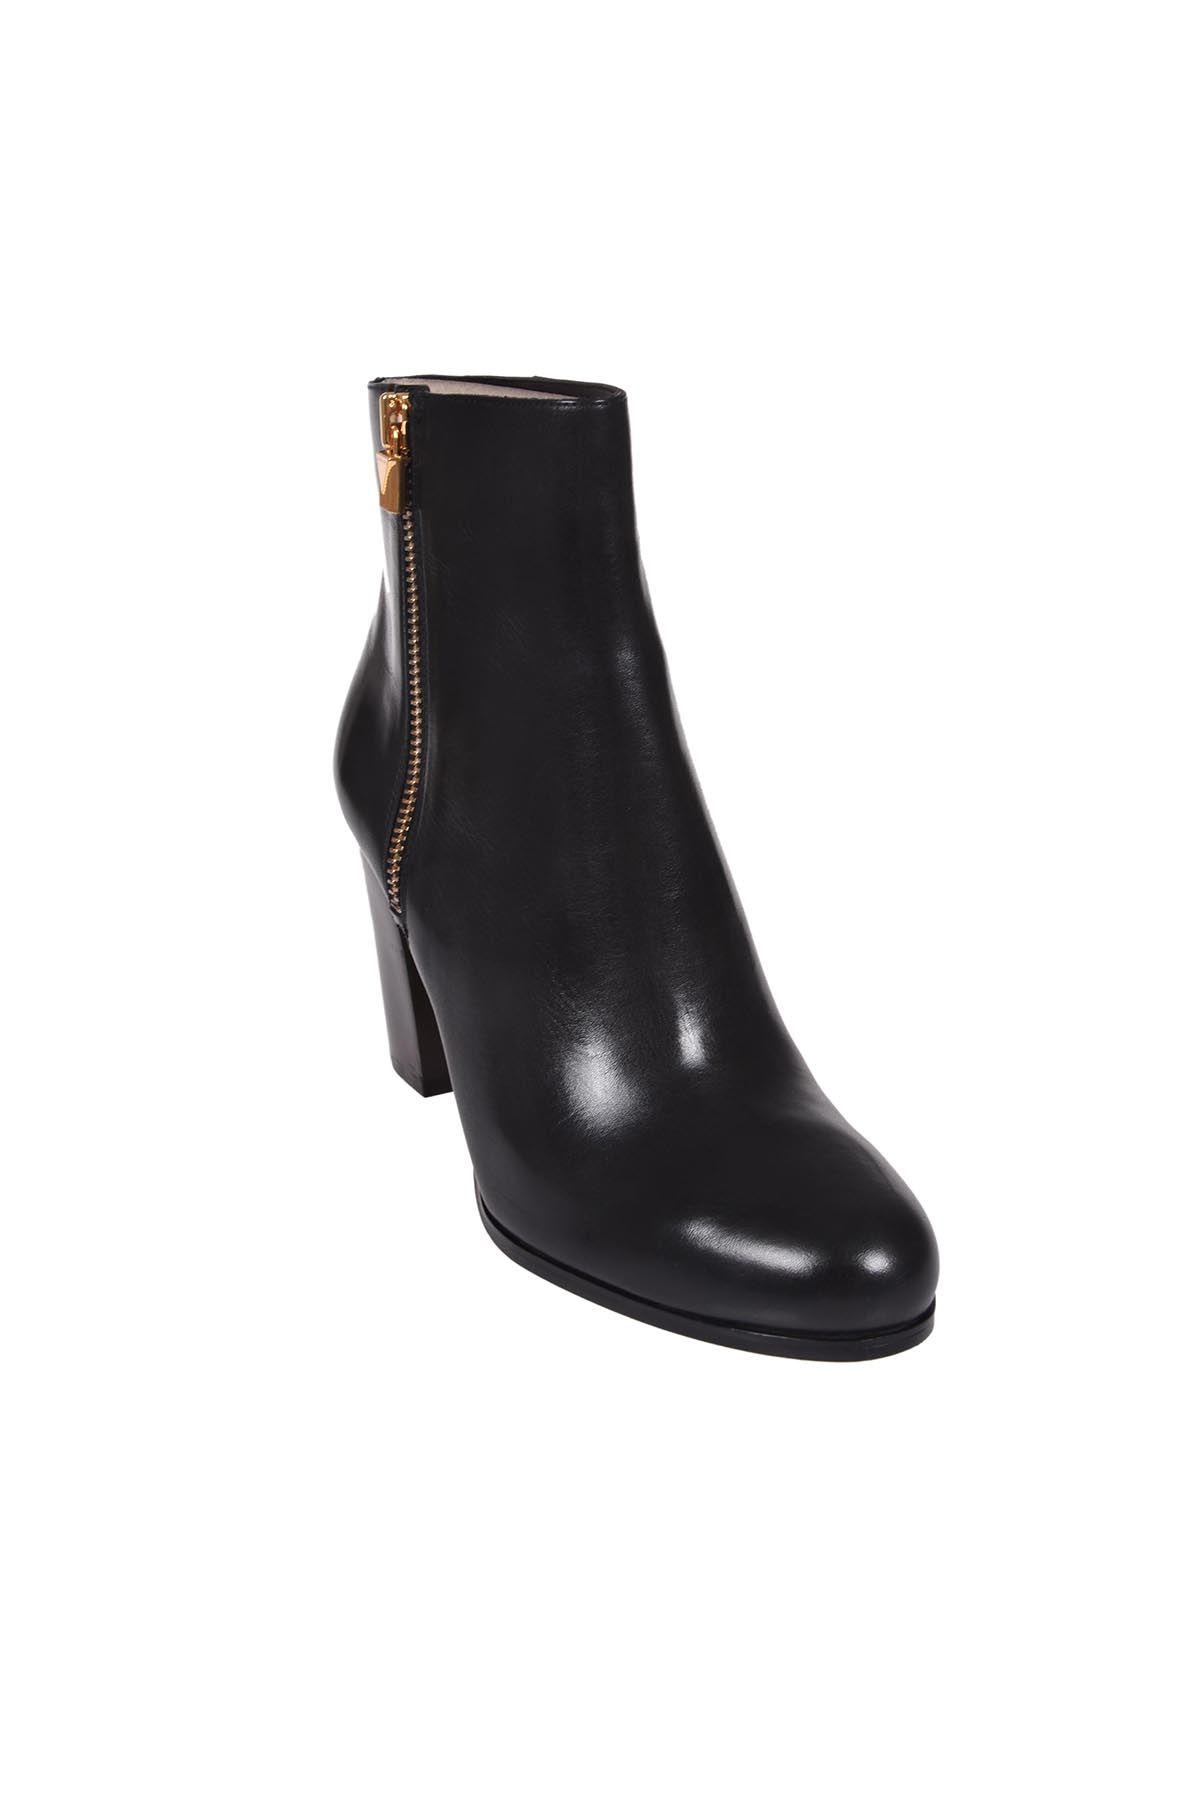 Michael Kors Michael Kors Margaret Ankle Boots Black